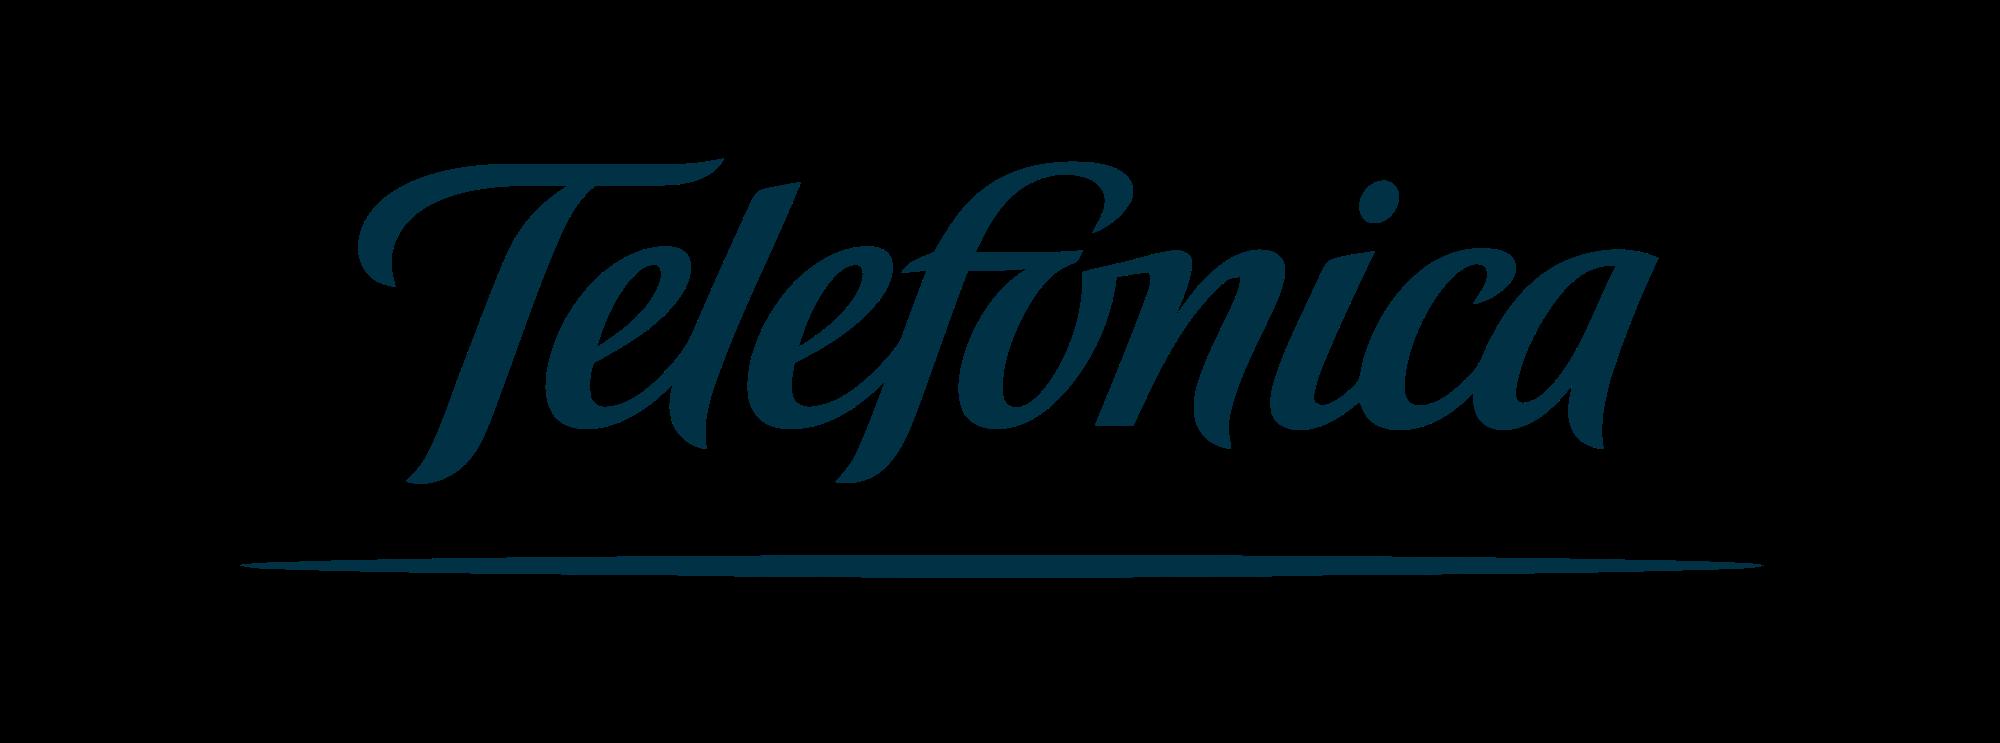 Telefónica.svg